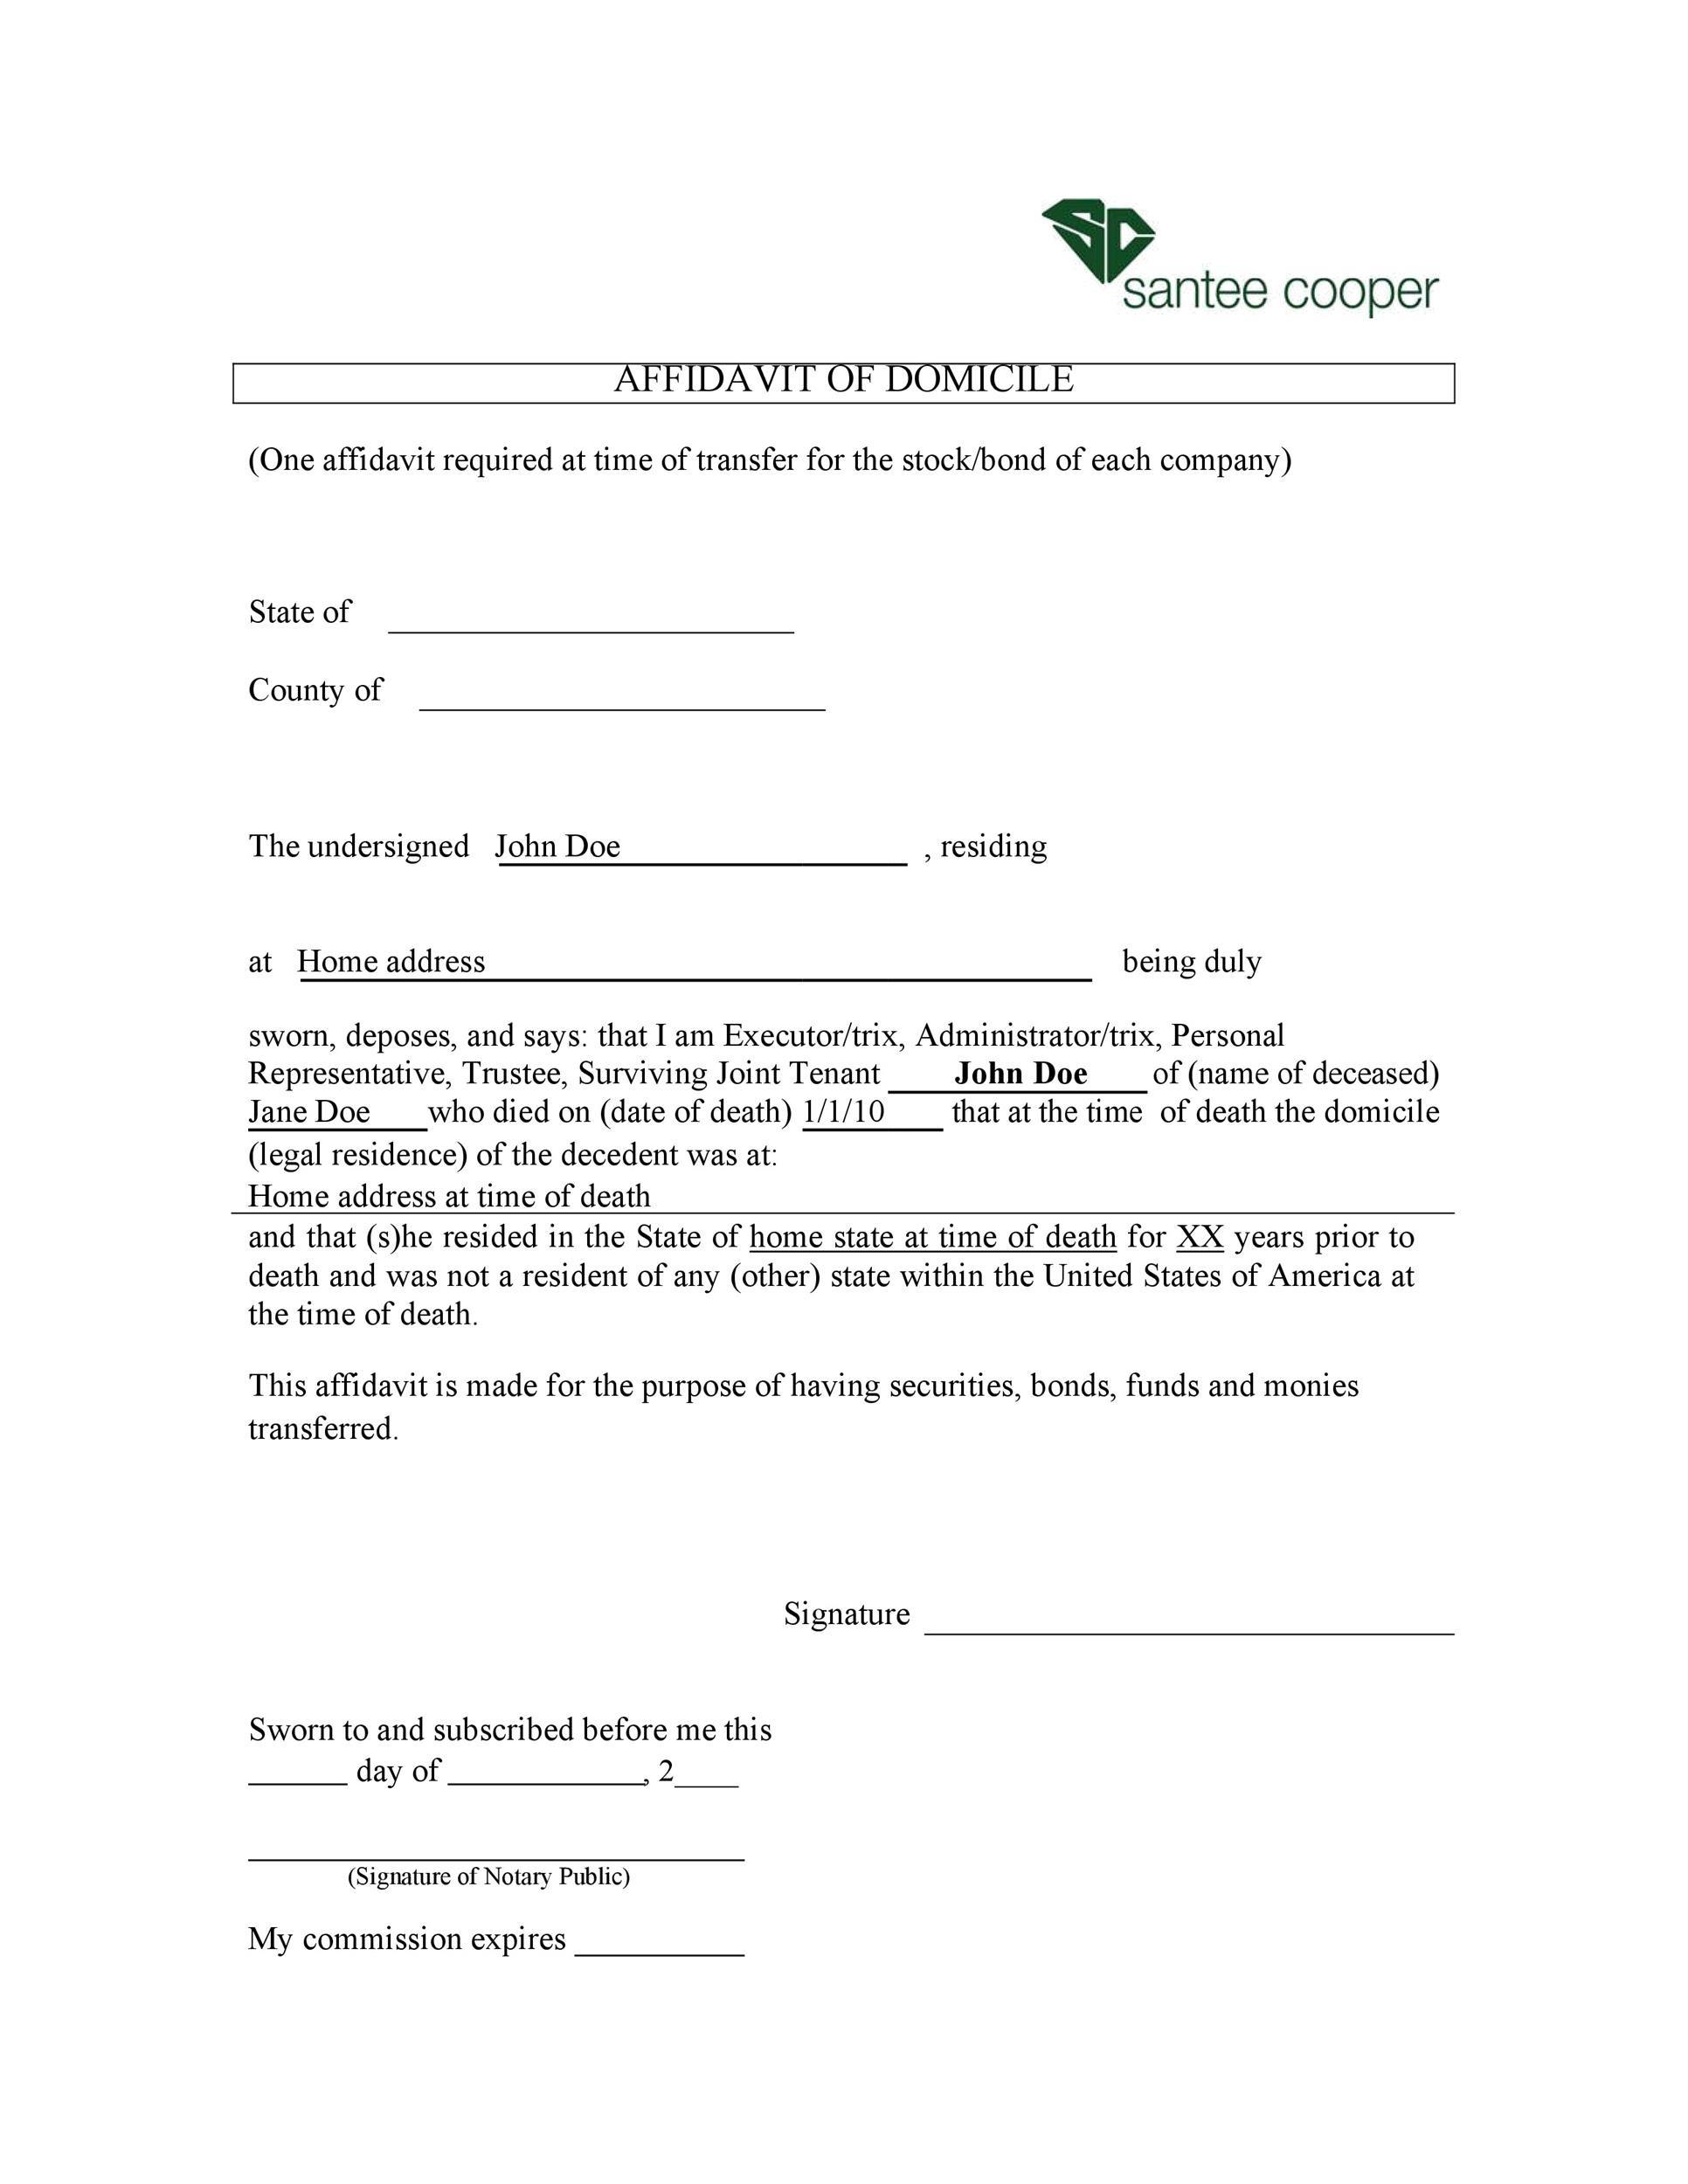 Free affidavit of domicile 12